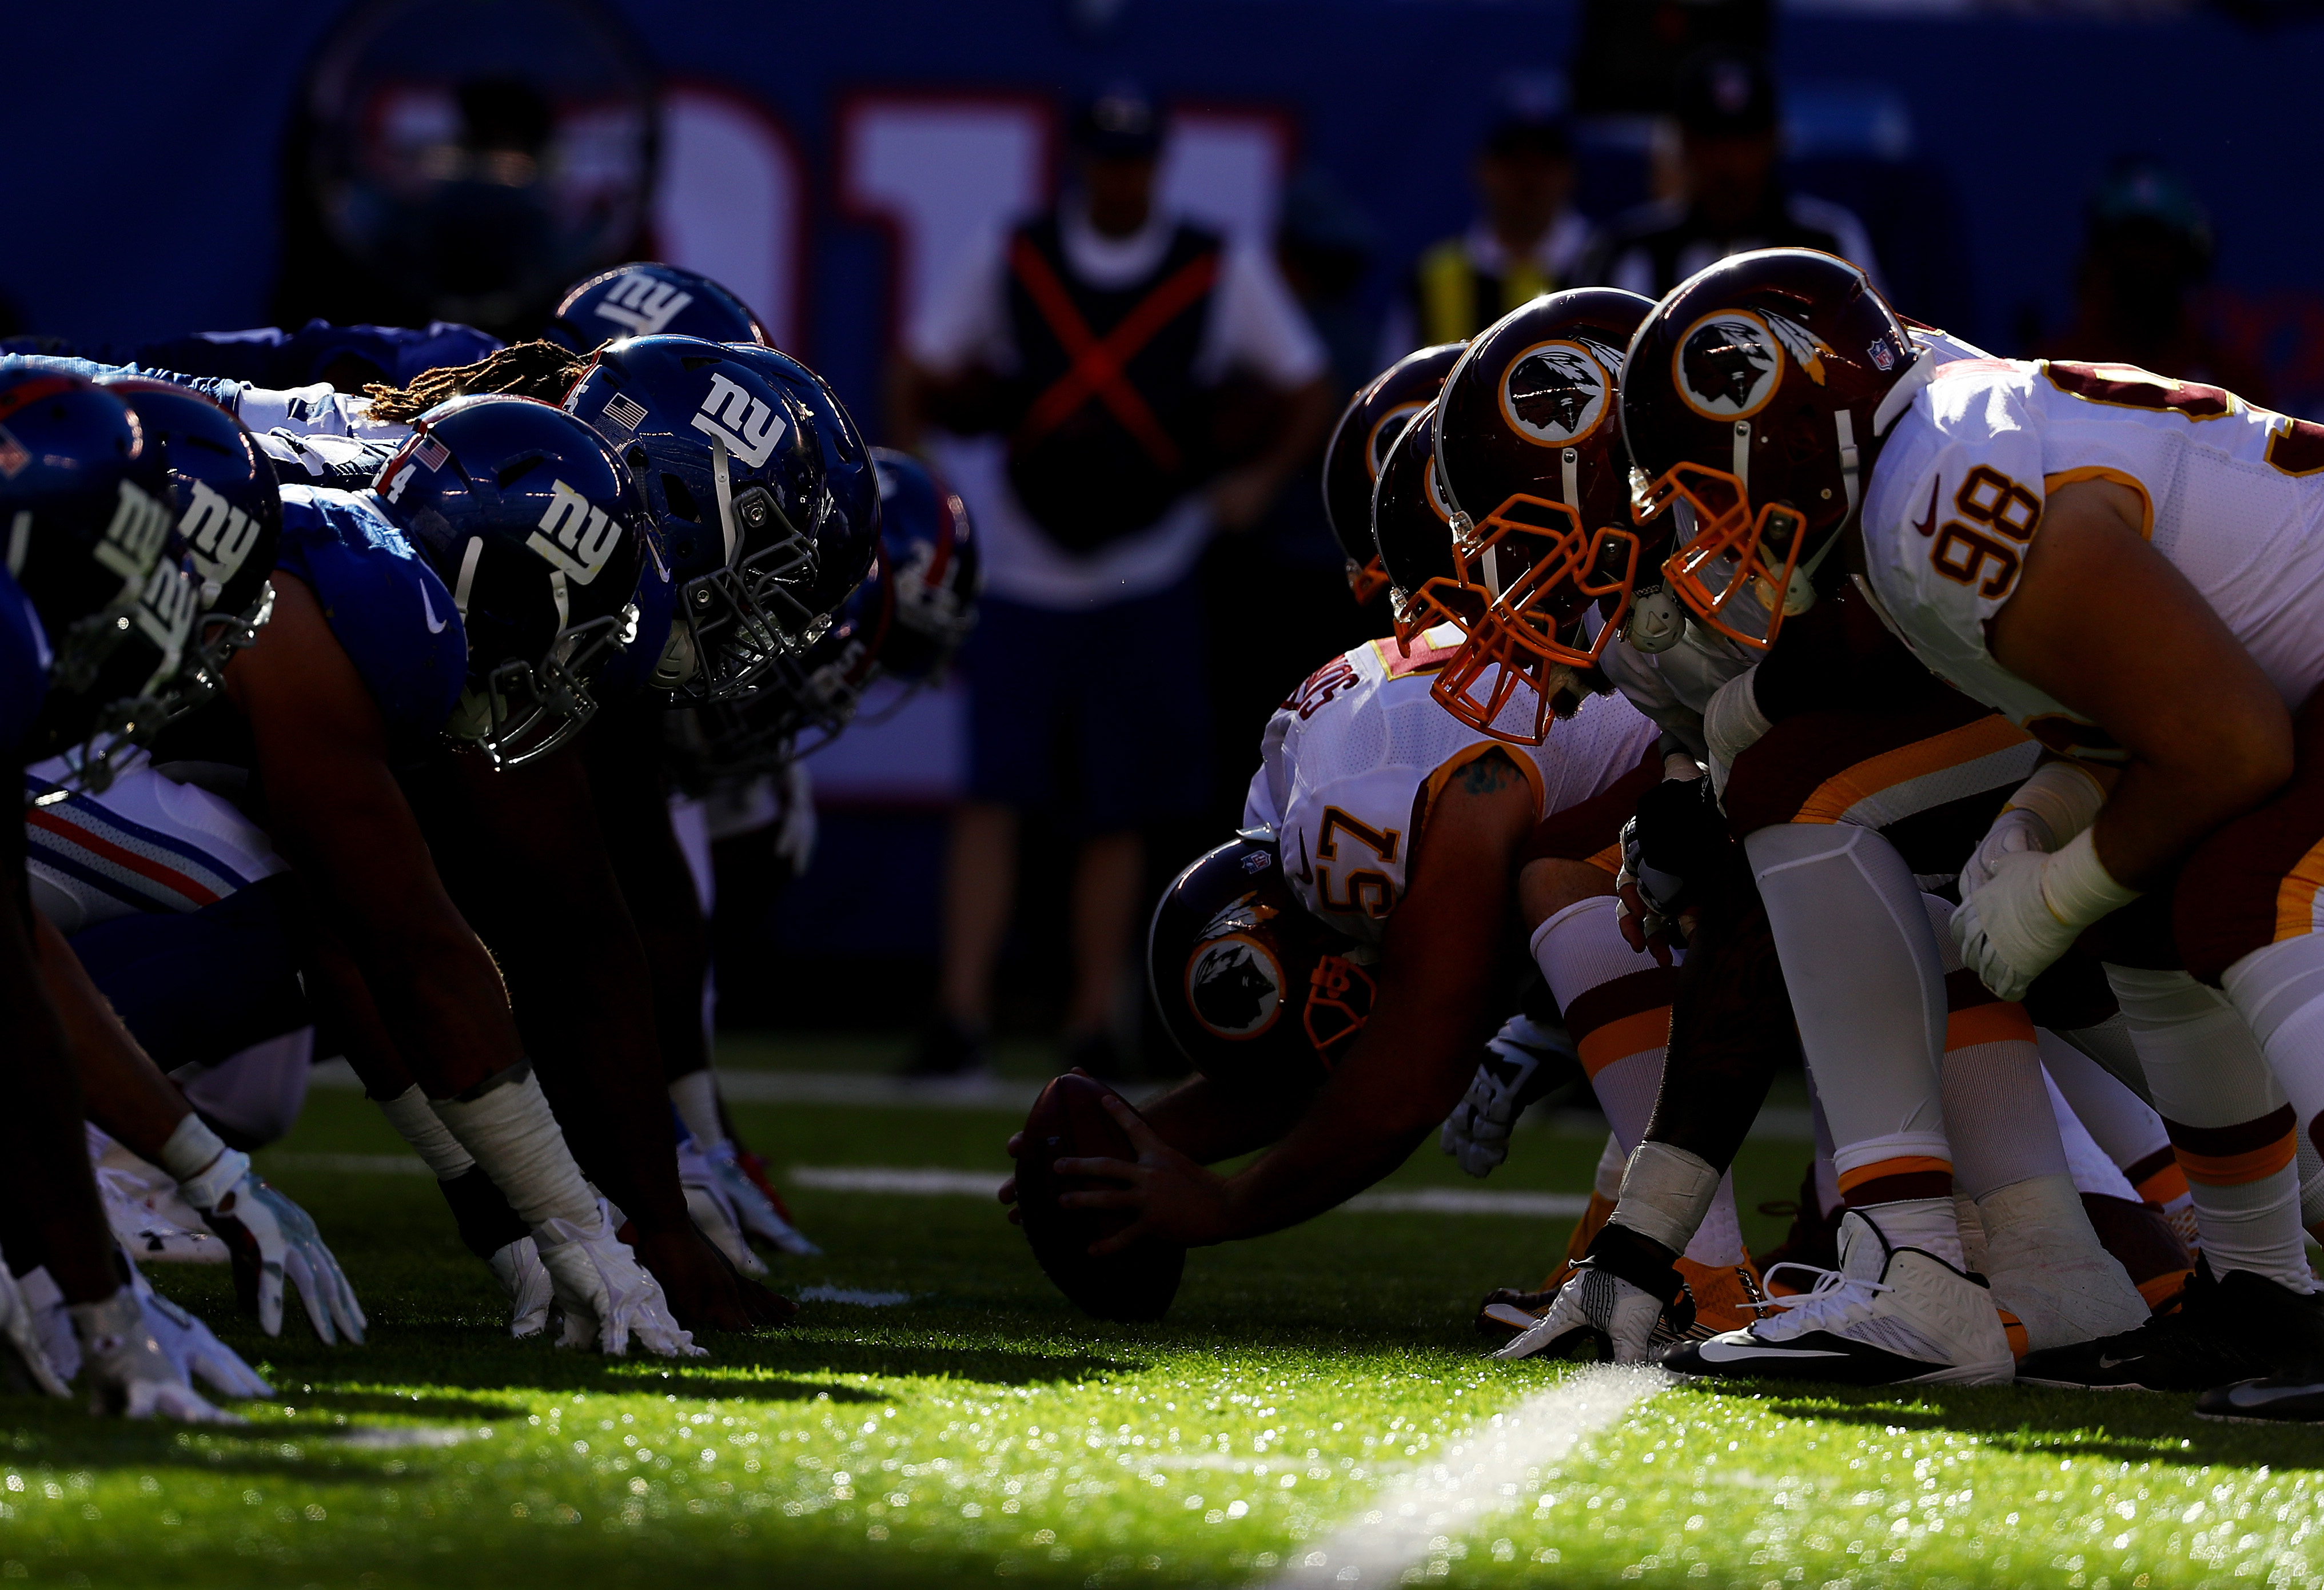 New York Giants vs. Washington Redskins: Prediction, preview, pick to win